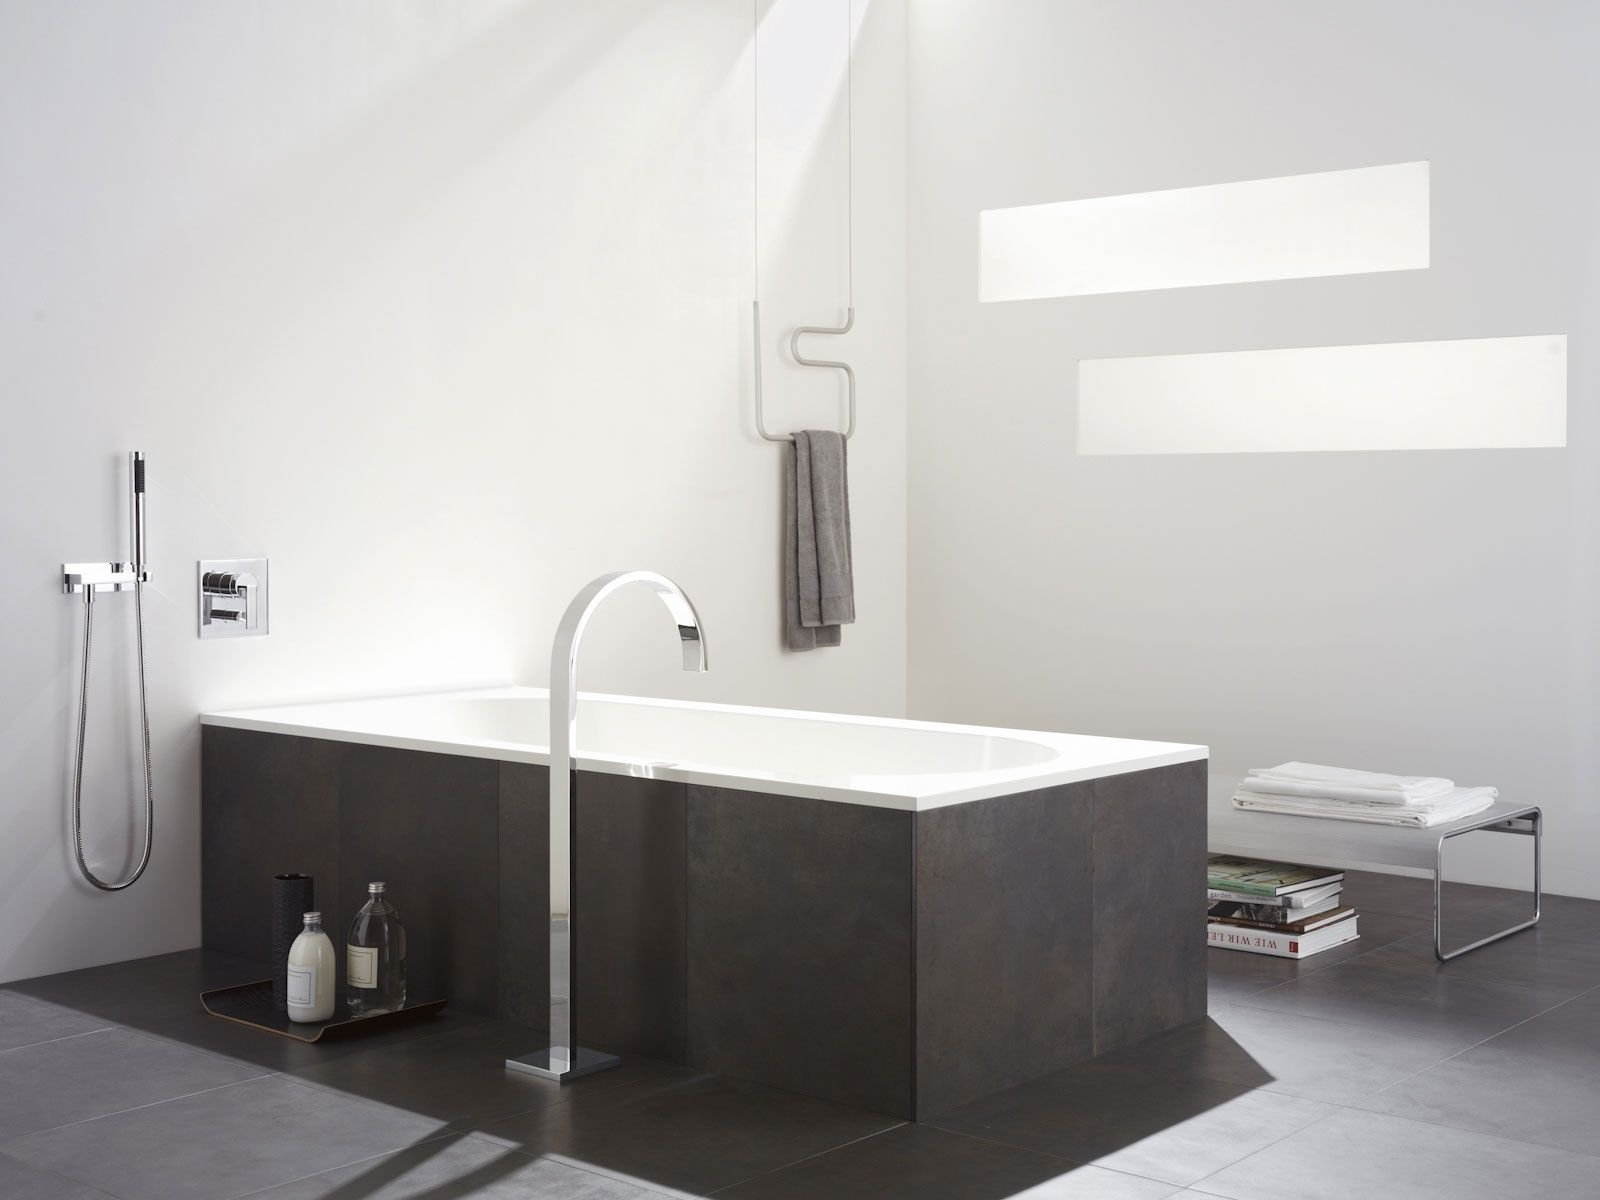 Dornbracht Tara Kitchen Faucet 1000 Images About Kitchen Bathroom Fixtures On Pinterest Rain